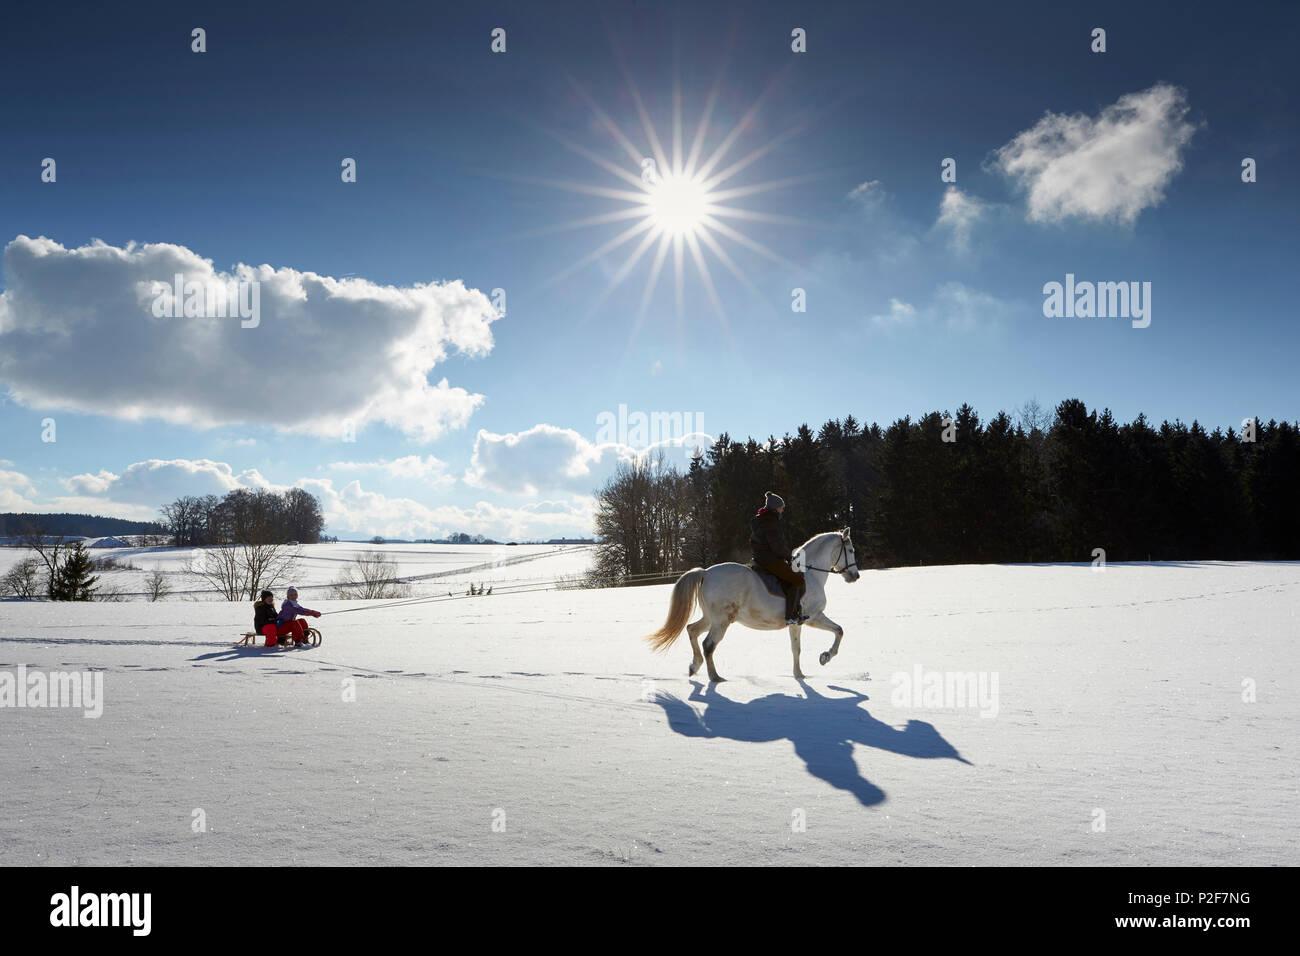 Mother on horse pulling children on sledge, Buchensee, Muensing, Bavaria Germany - Stock Image